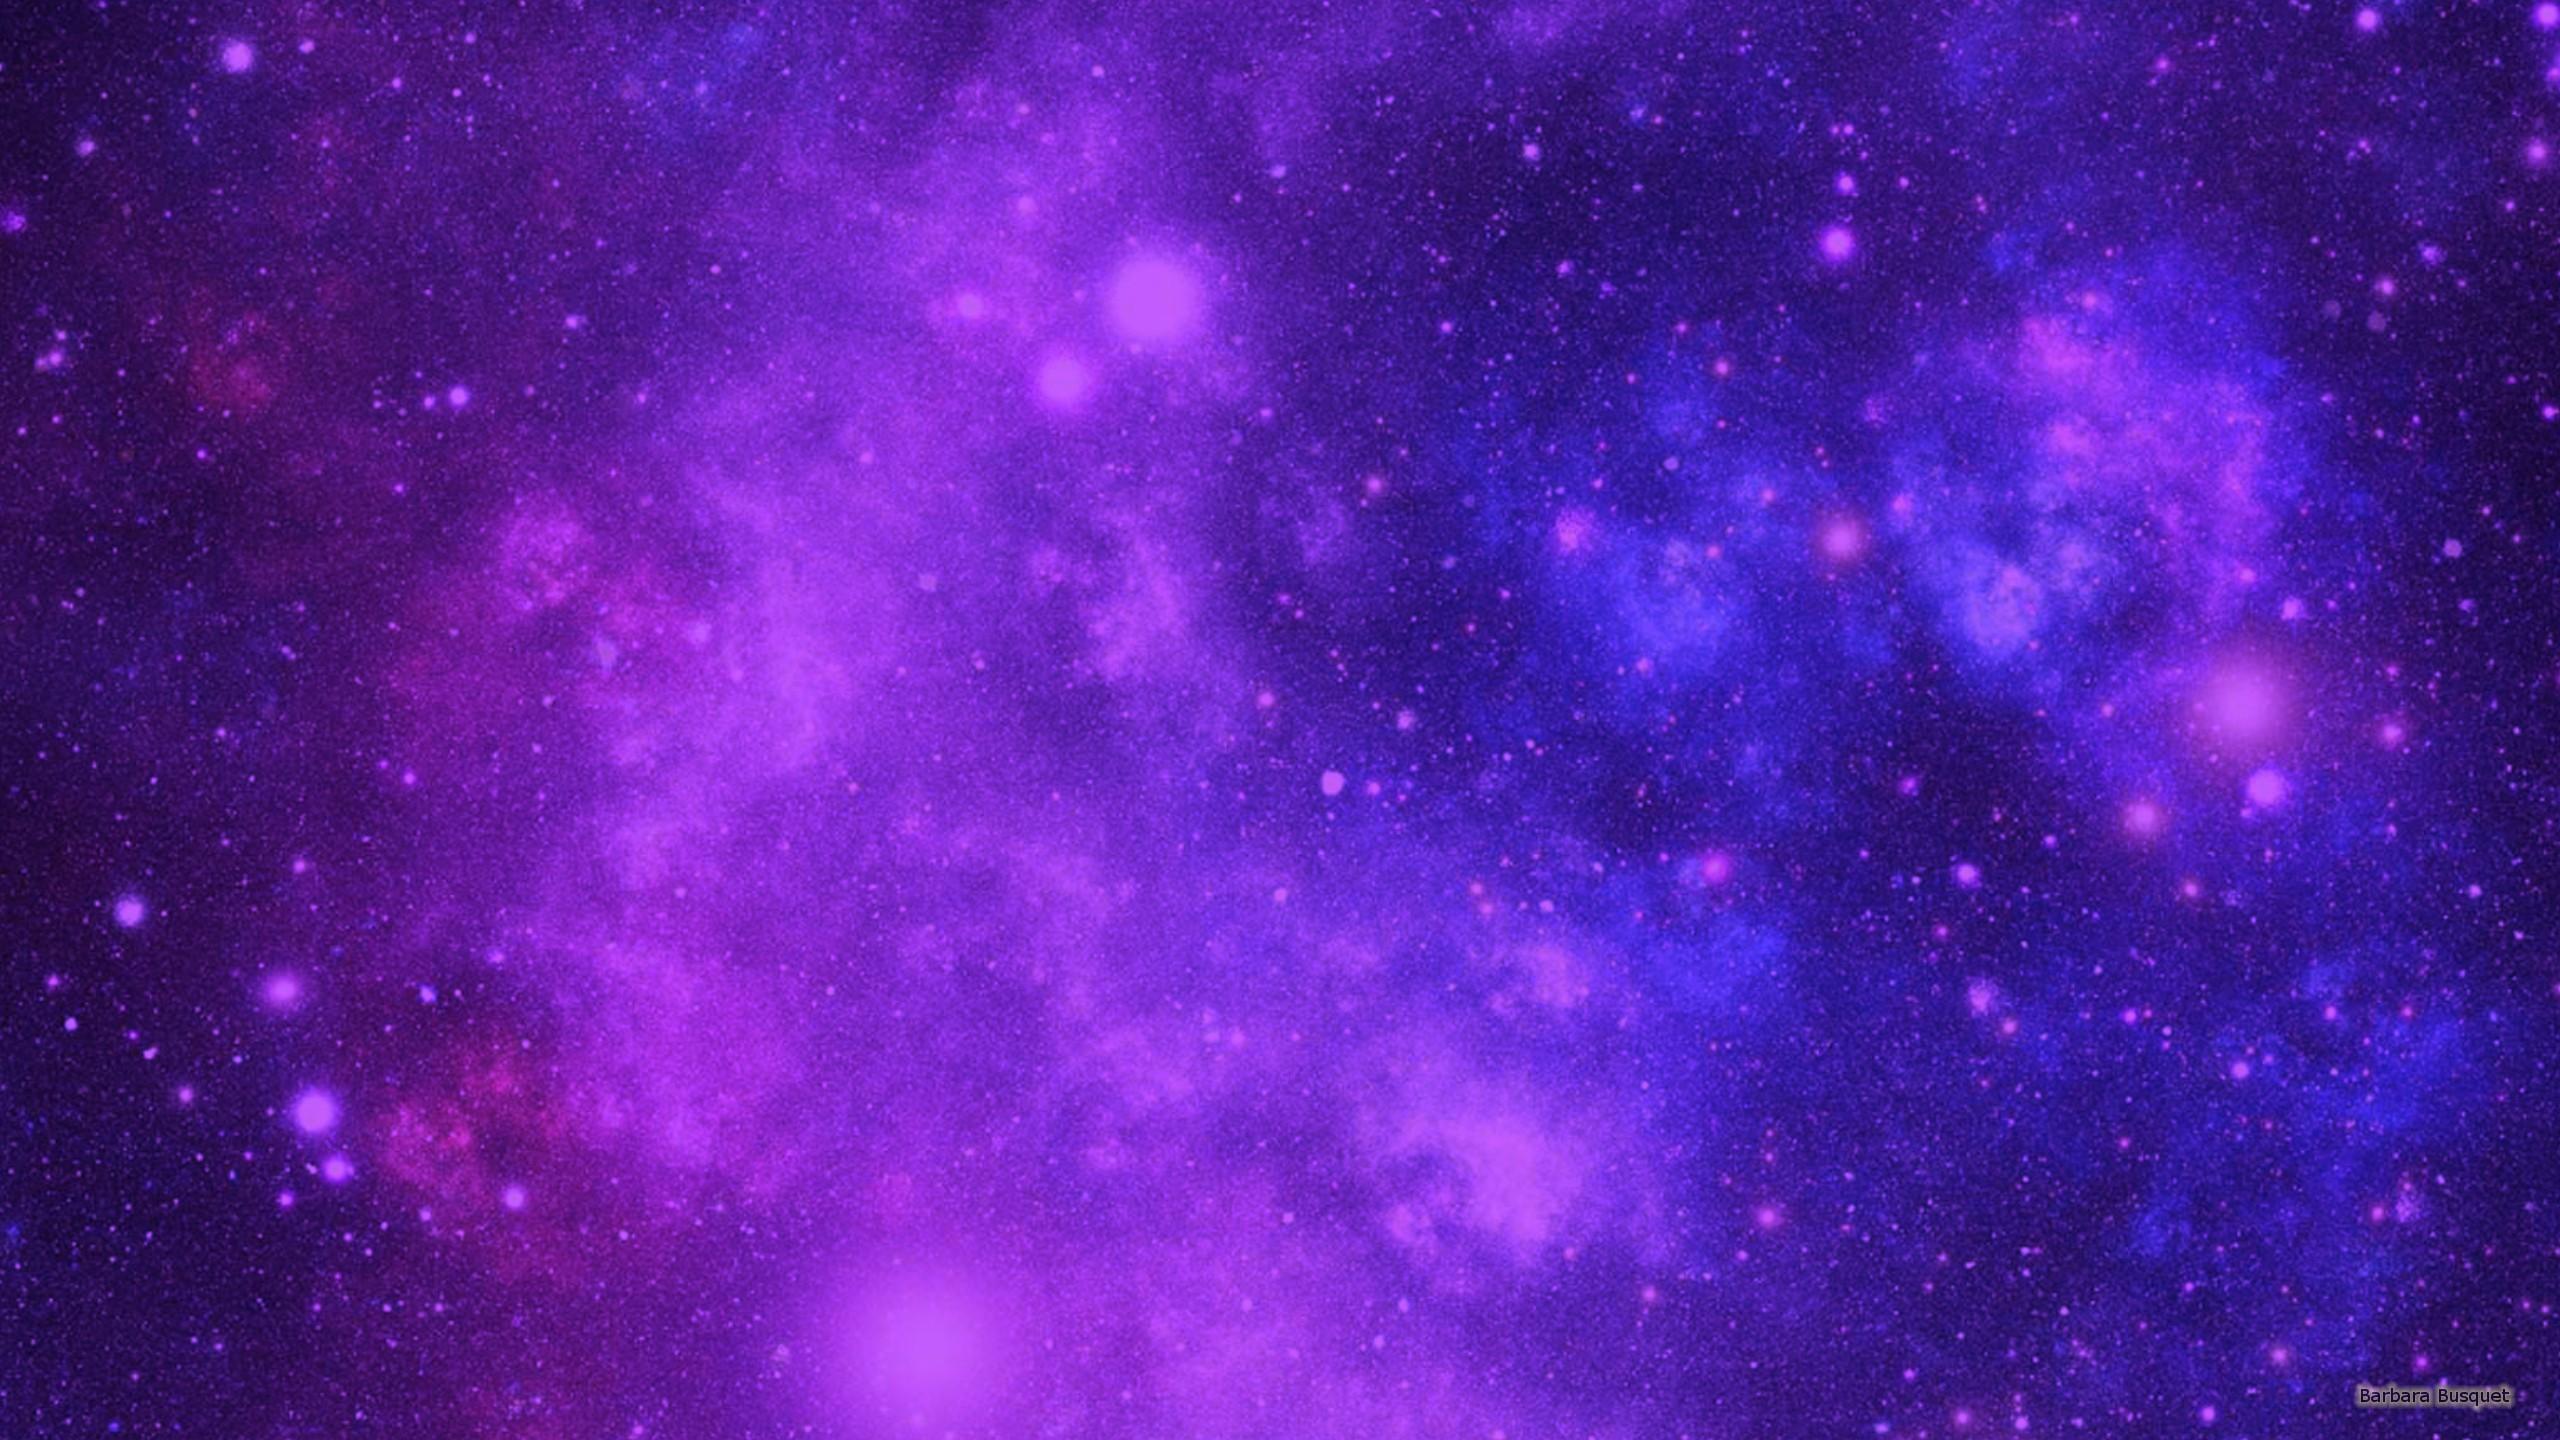 Dark Purple Background Tumblr